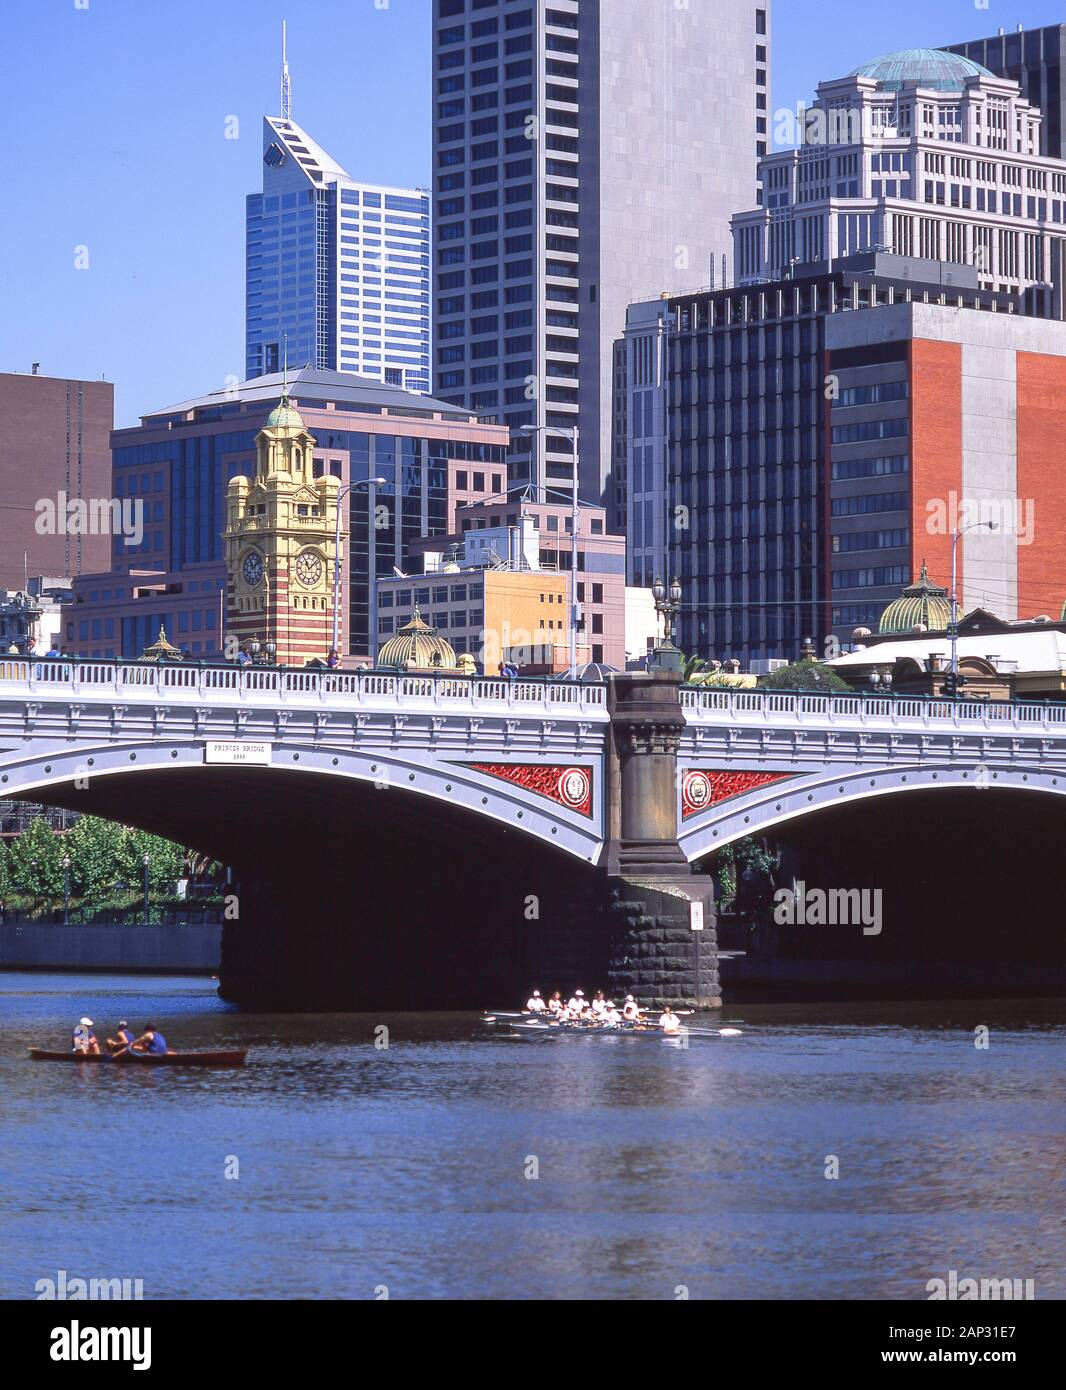 City and Princes Bridge across Yarra River, Melbourne, Victoria, Australia Stock Photo